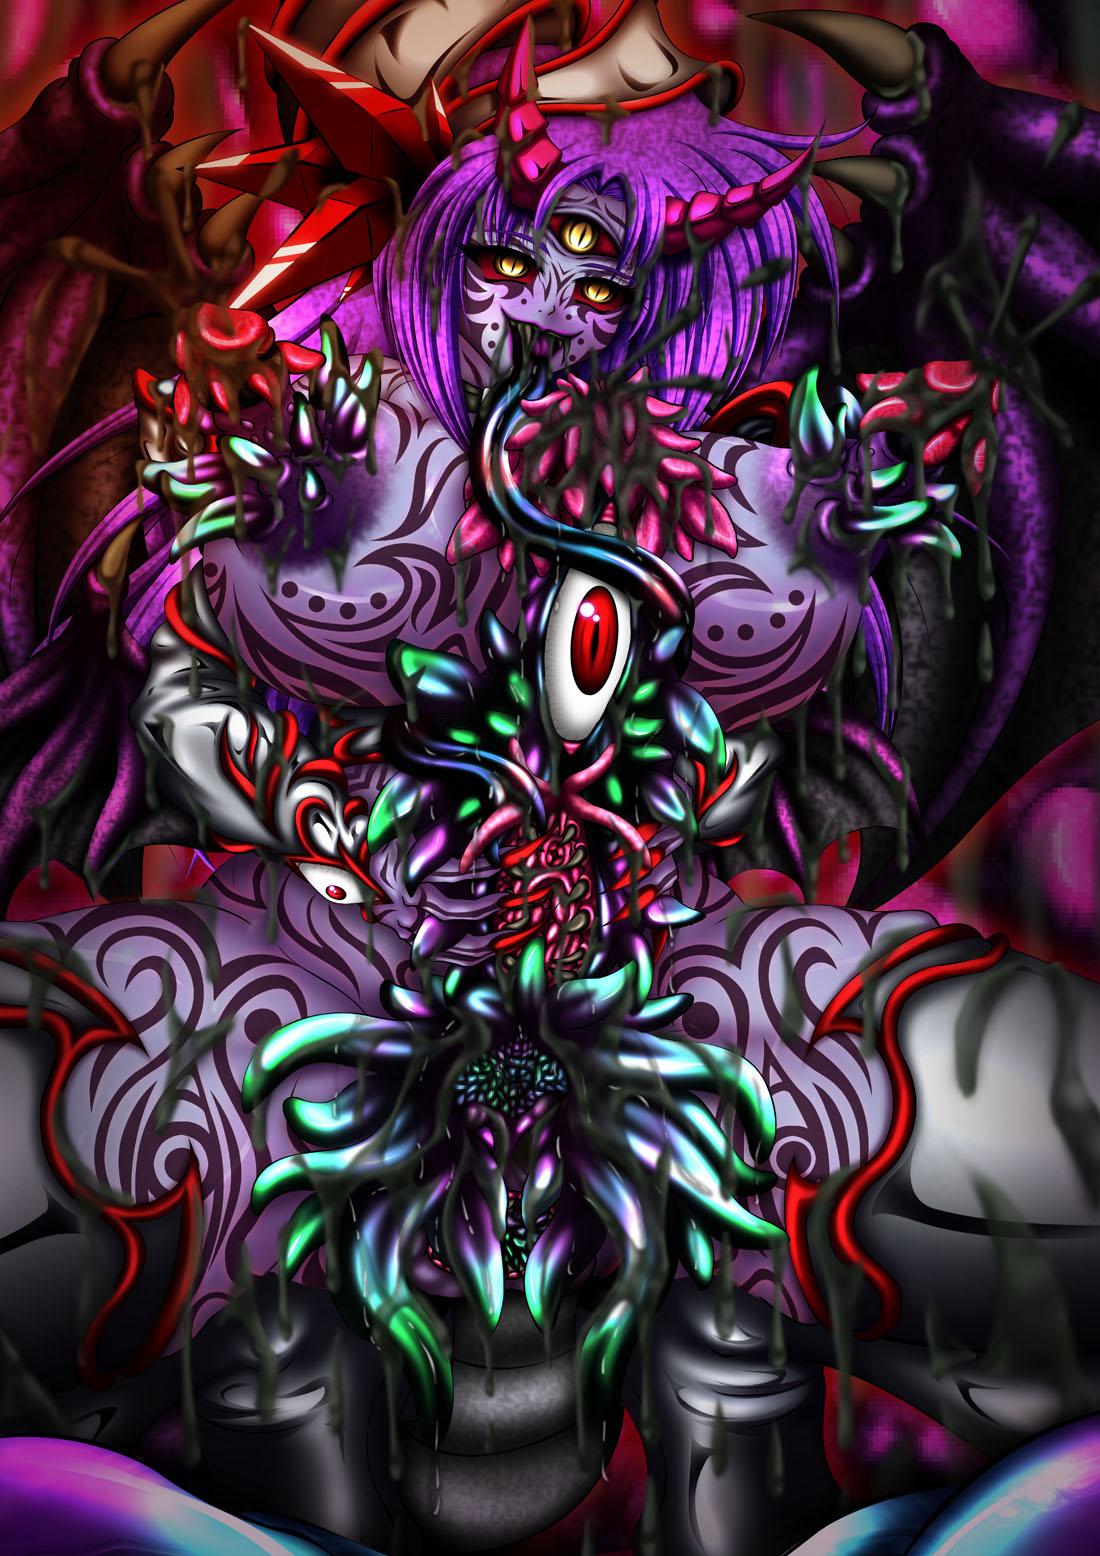 nude rachel gi joe nichols Fire emblem awakening female robin